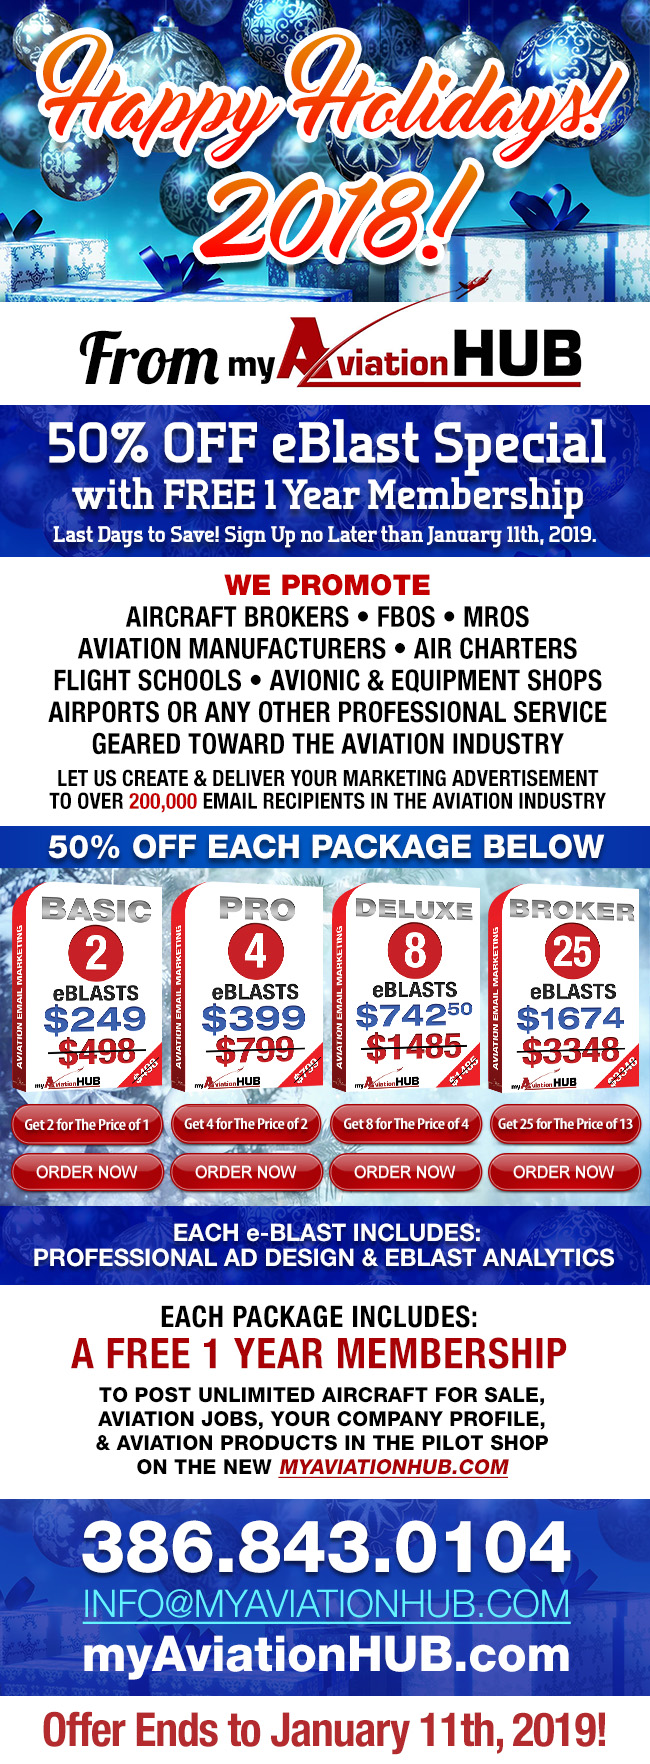 Holidays 2018 Special | myAviationHUB Aviation and Aircraft Marketing